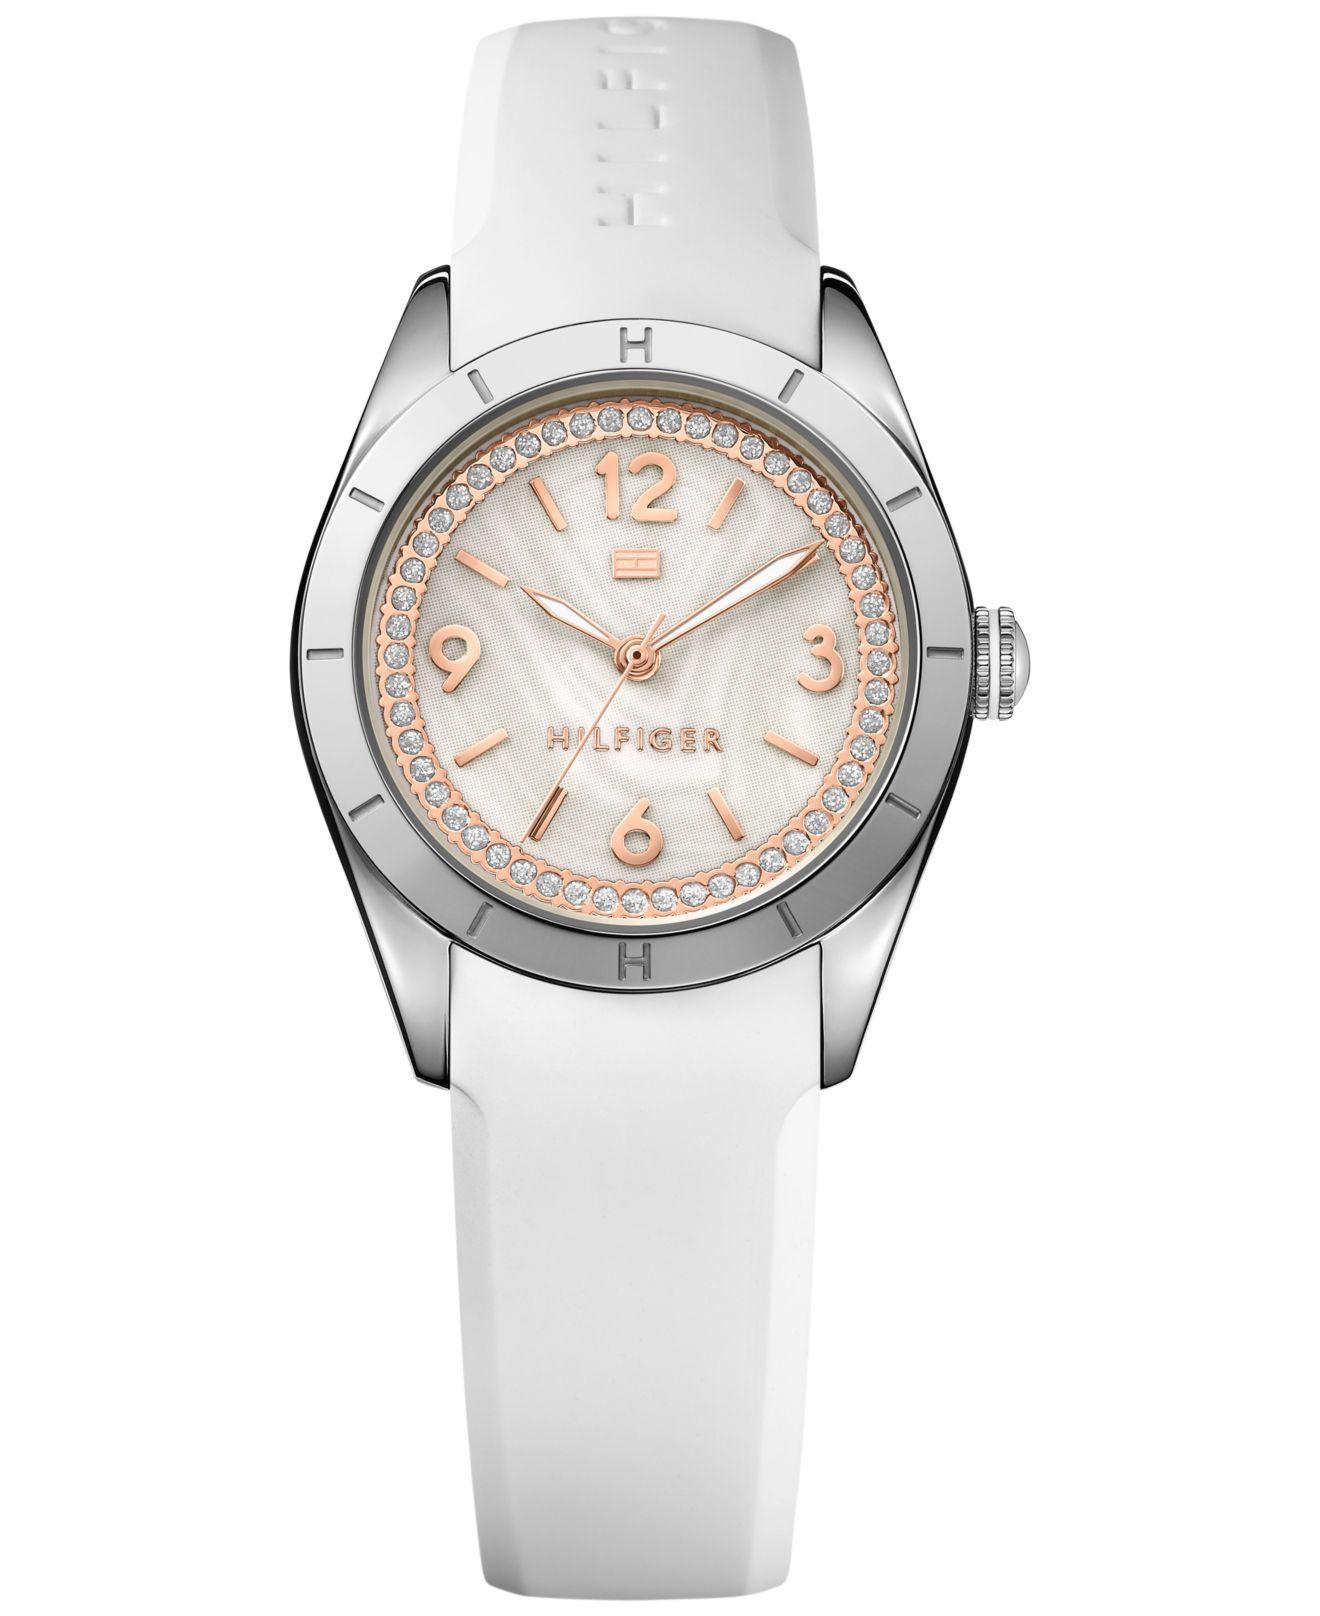 265815829 Tommy Hilfiger Women's White Silicone Strap Watch 30mm 1781549 in ...